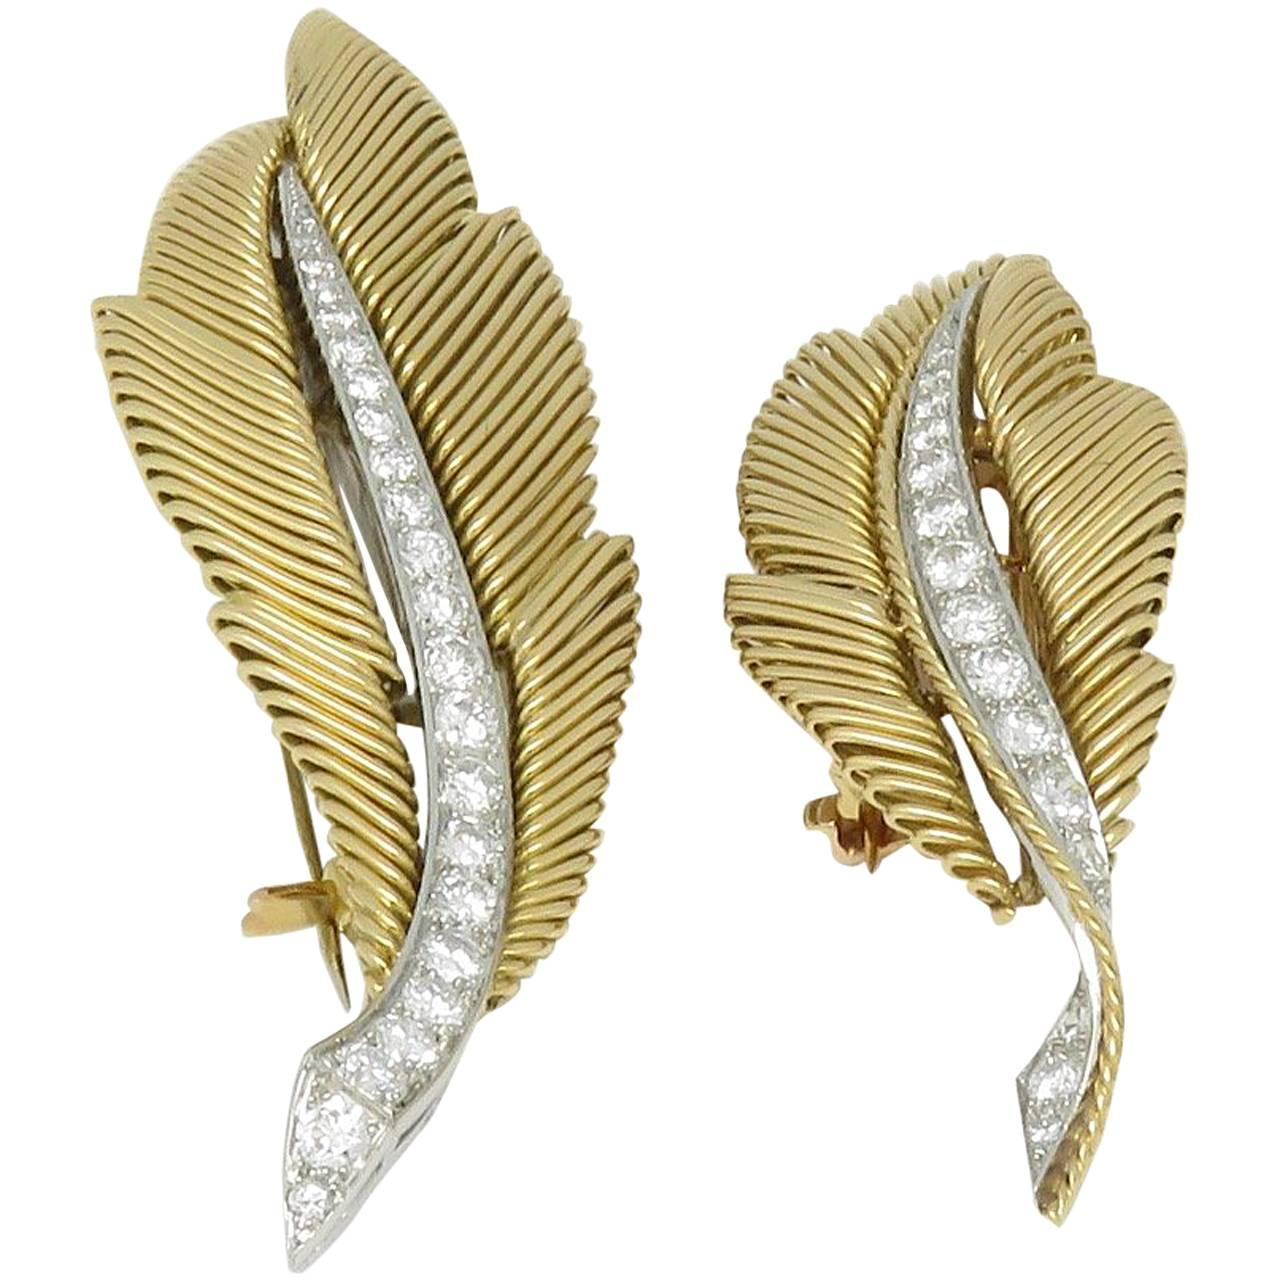 Van Cleef & Arpels Diamond Gold and Platinum Brooches